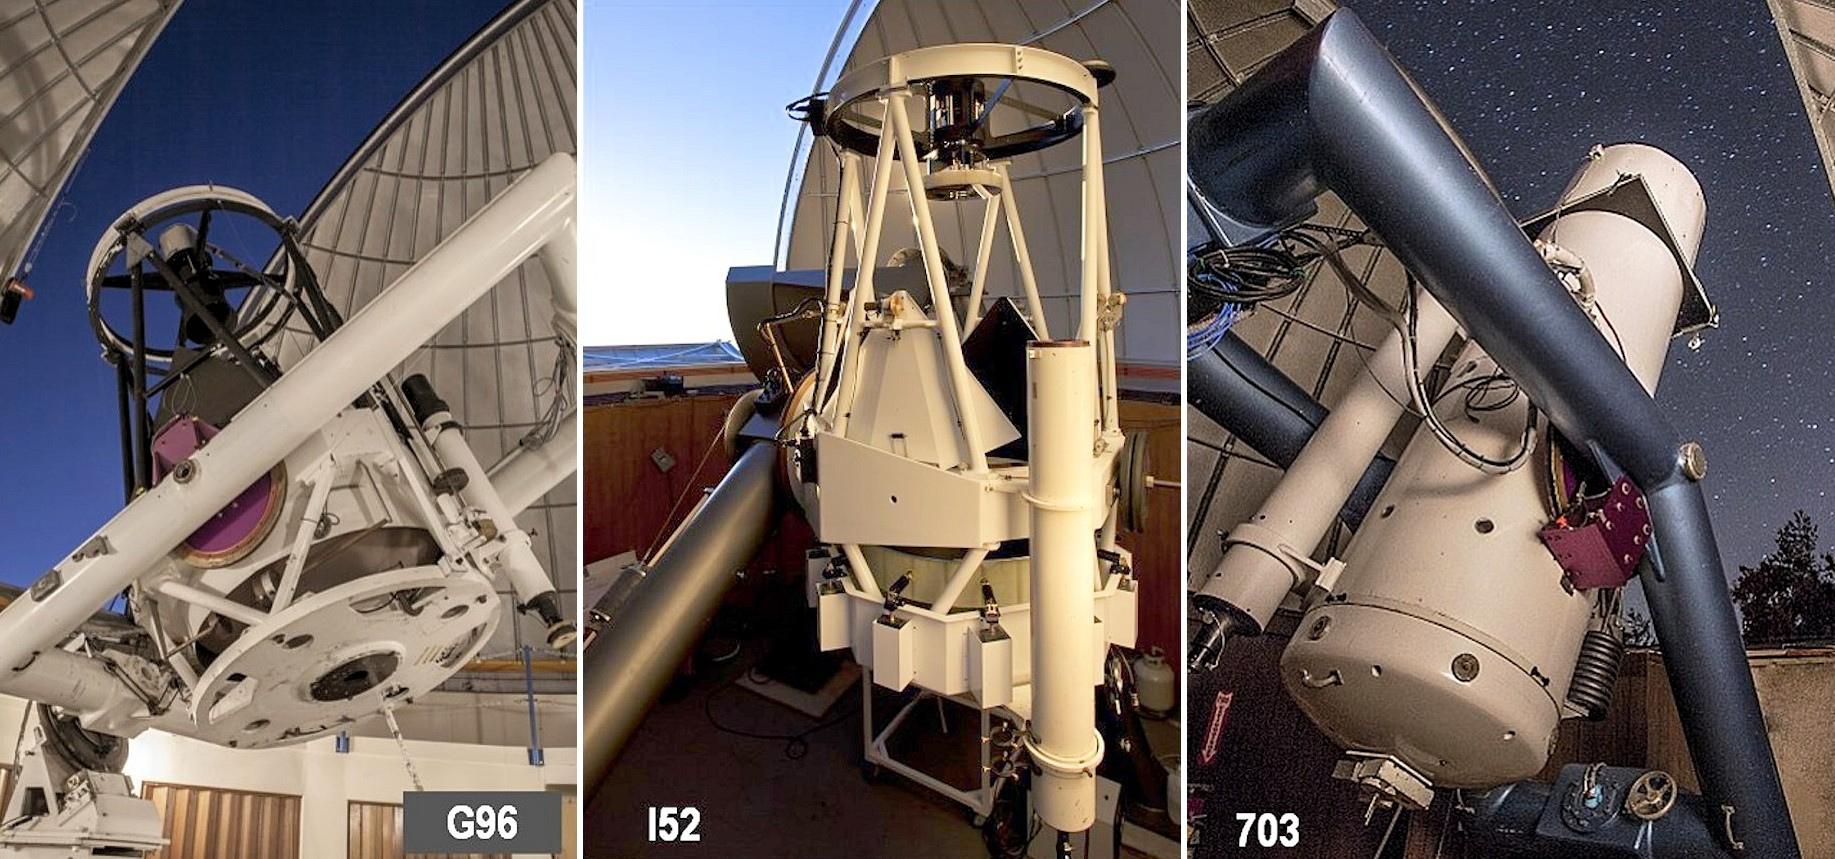 CSS-telescopes.jpg.33f1fc38933cabfa0e3e4cf77ce845eb.jpg